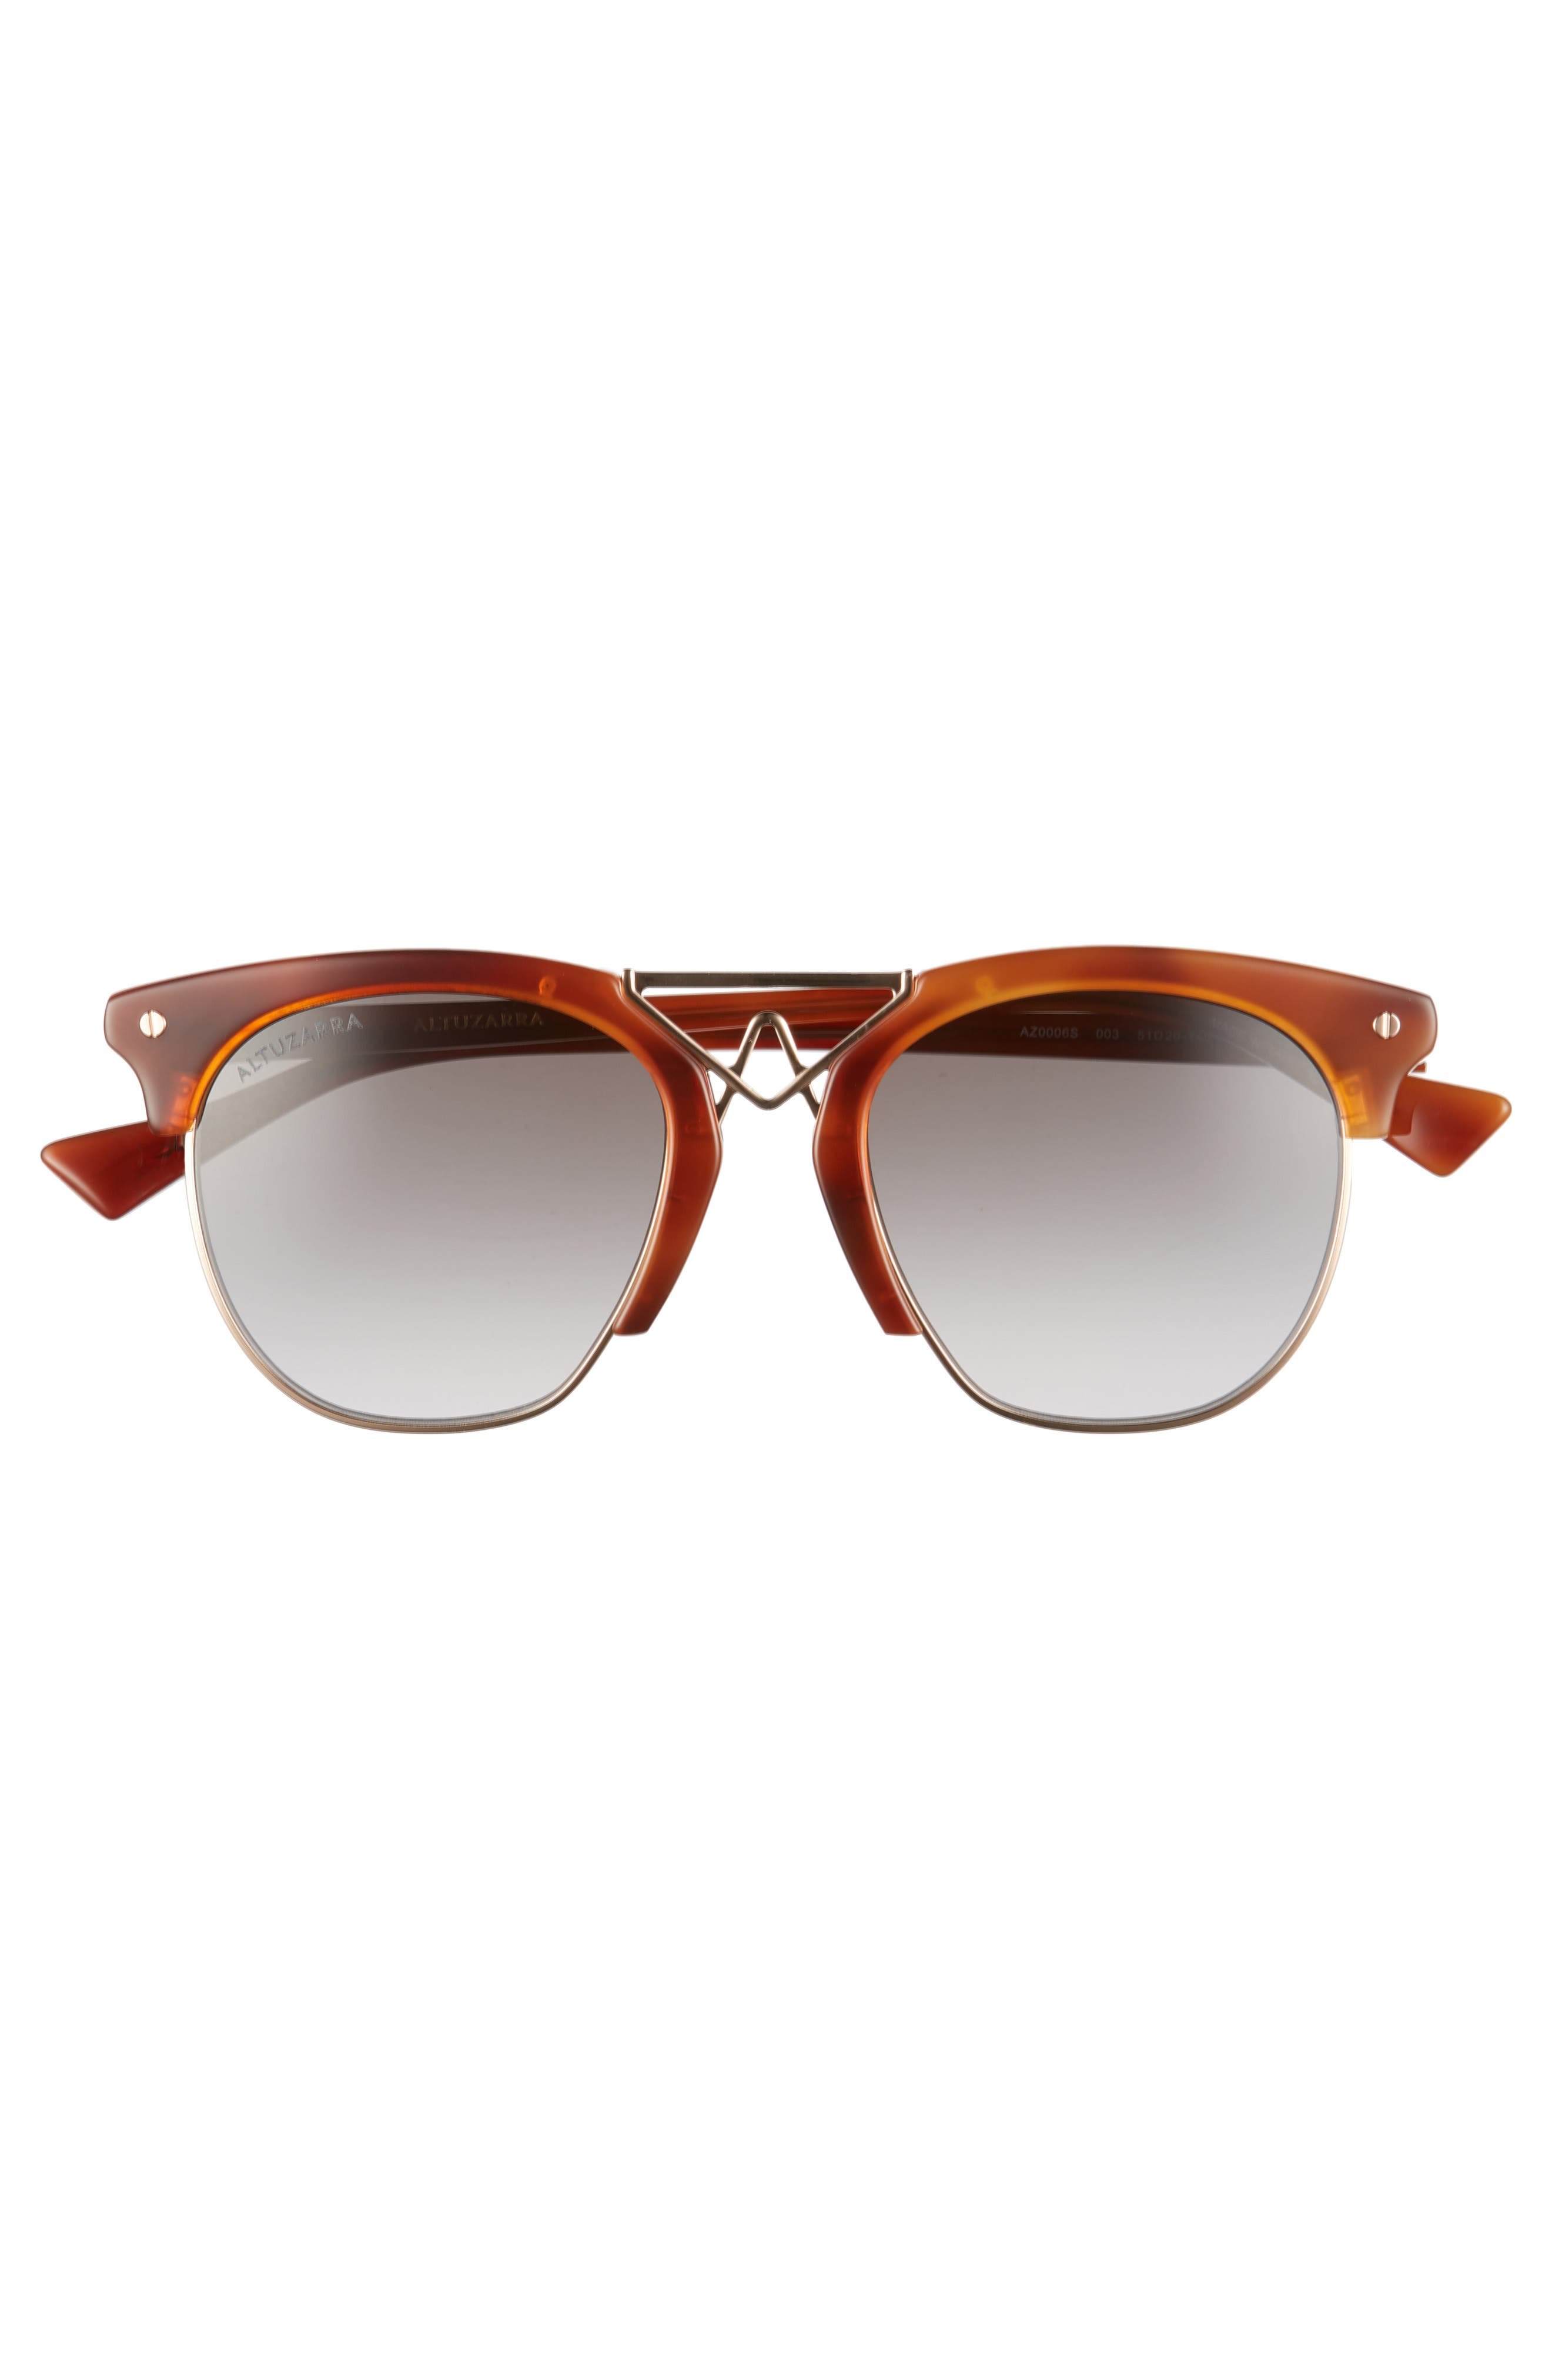 51mm Round Sunglasses,                             Alternate thumbnail 3, color,                             Havana